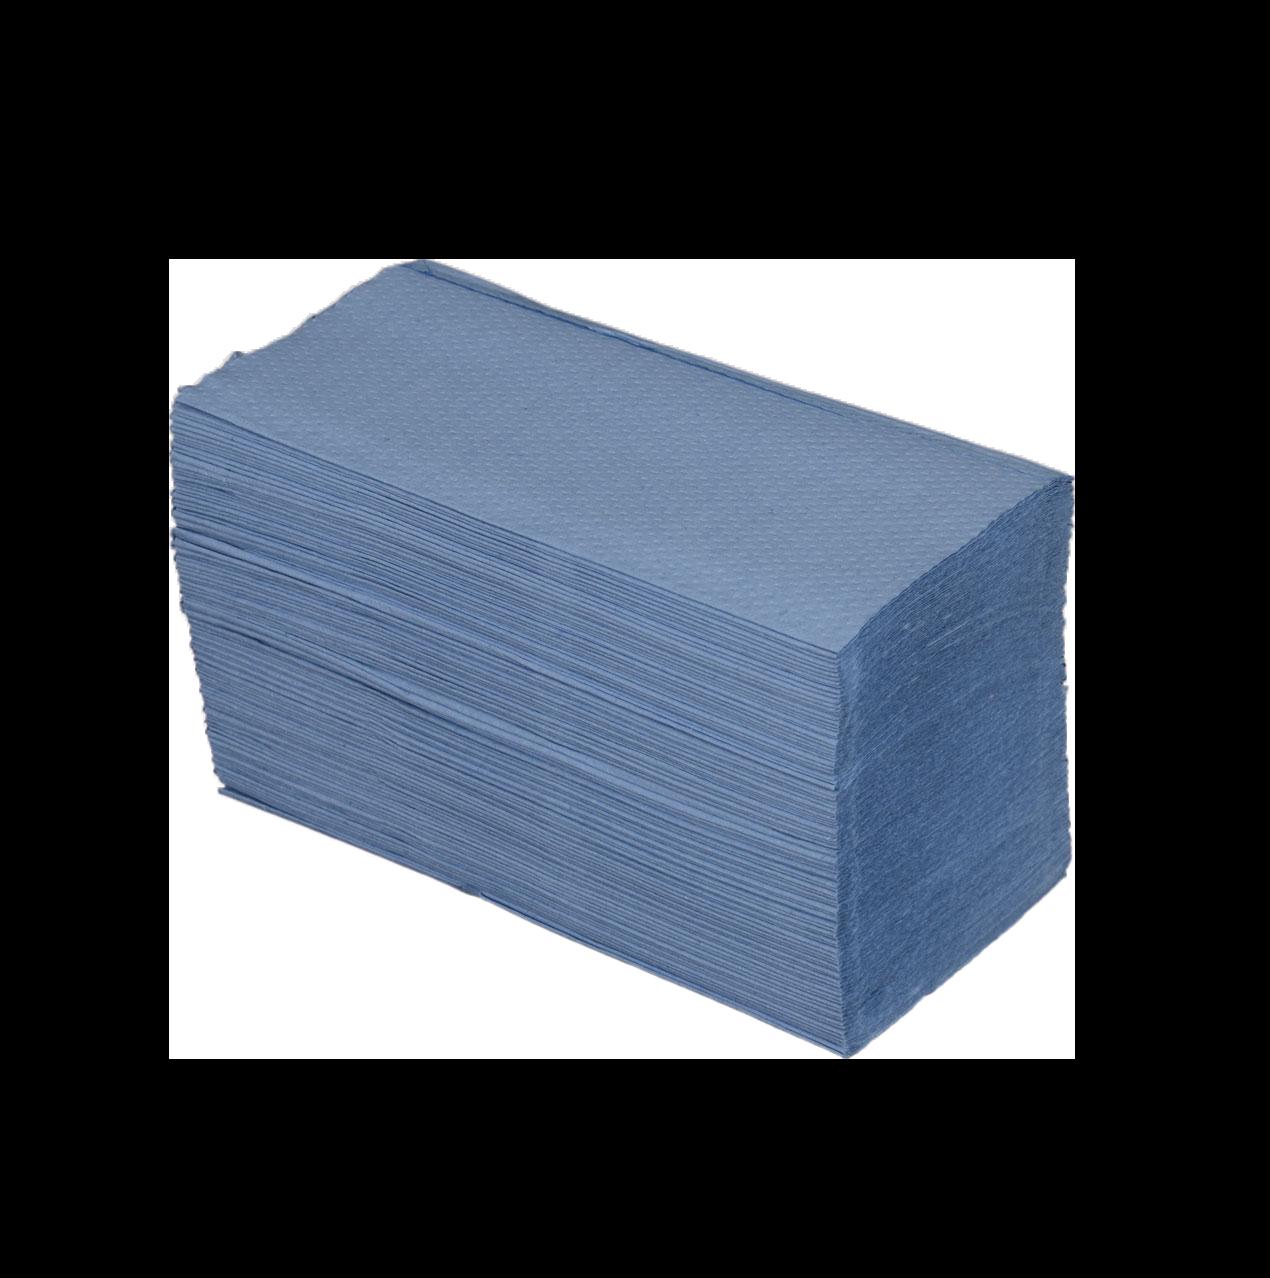 HANDTOWEL - Blue Vfold 21x22cm (cel.1p)